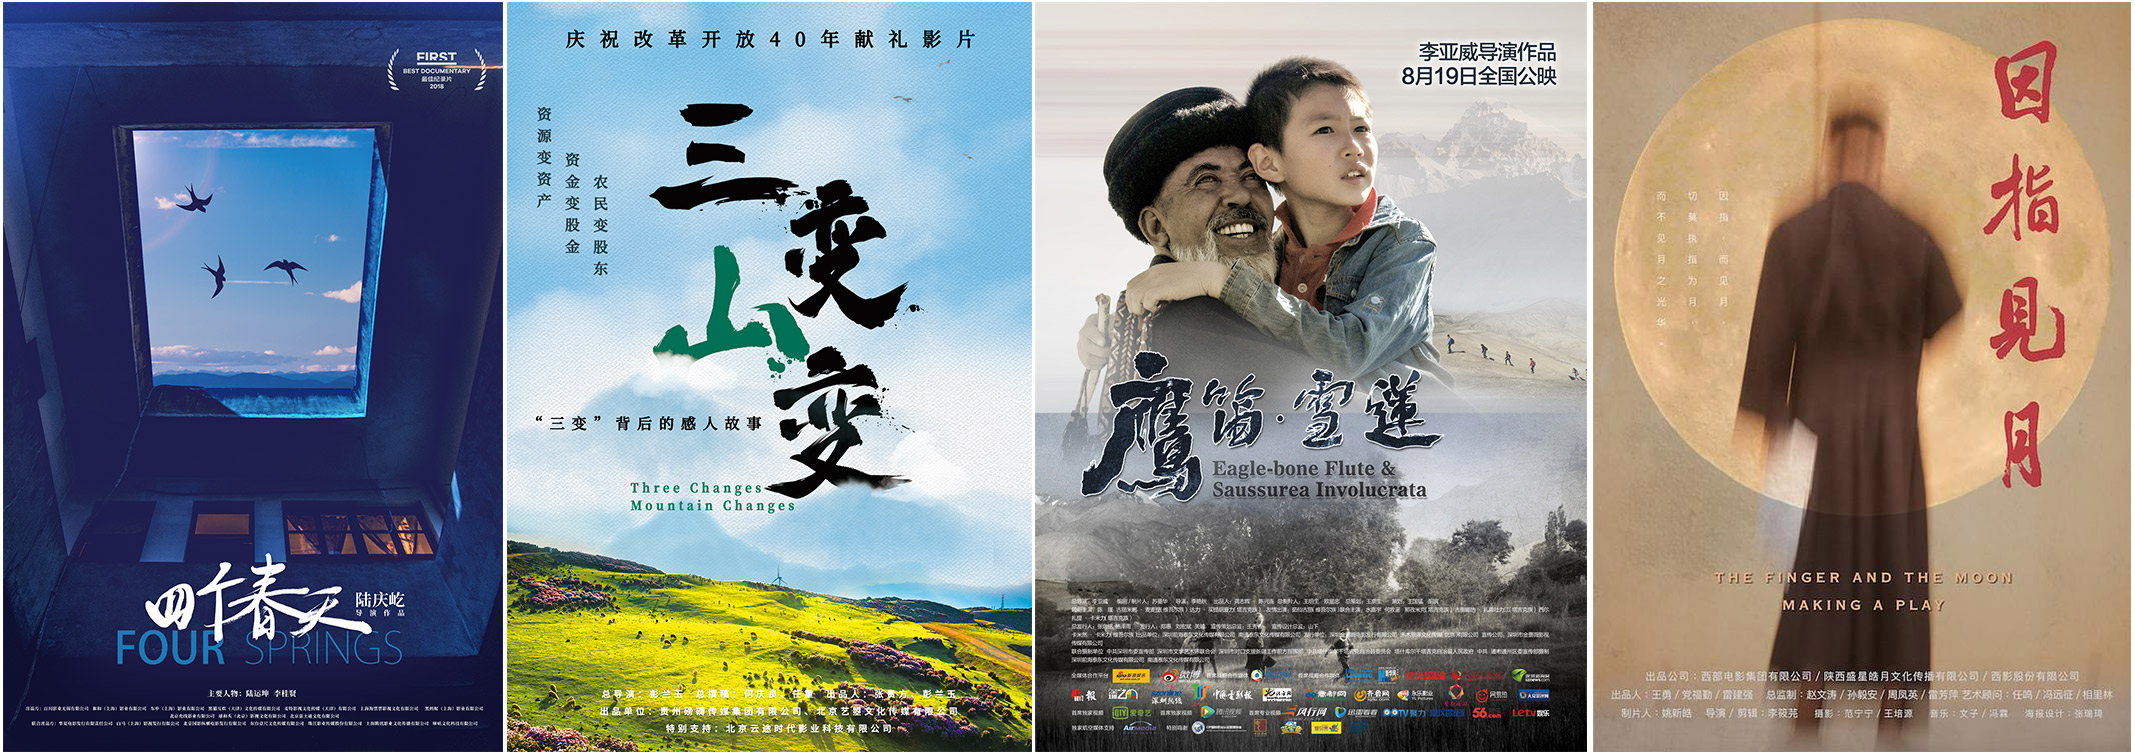 Jack Gao: Cinema app could transform movie-watching - China